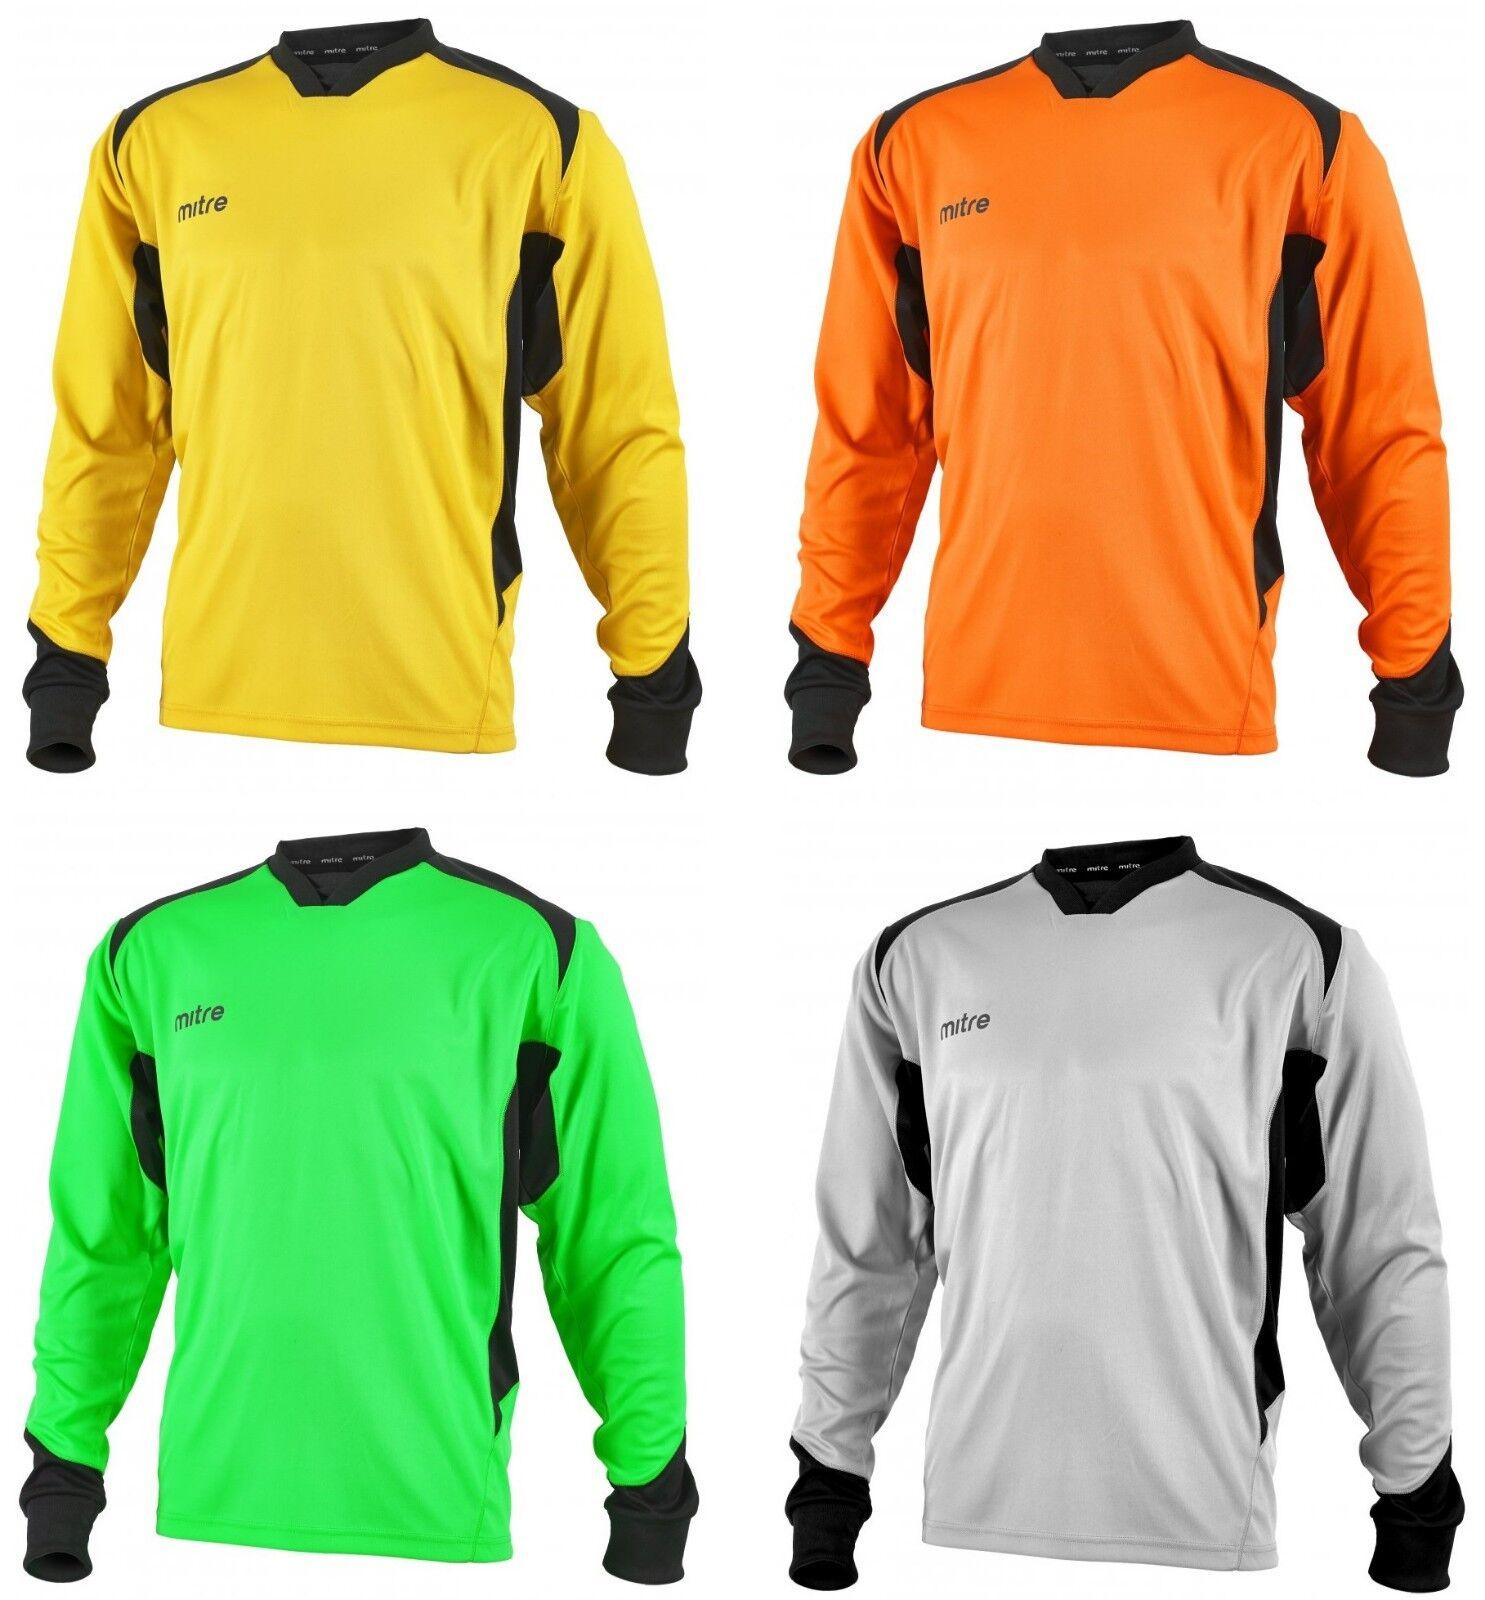 Mitre Futbol Manga Larga objetivo Keeper Camiseta Arquero defensa Portero Jersey